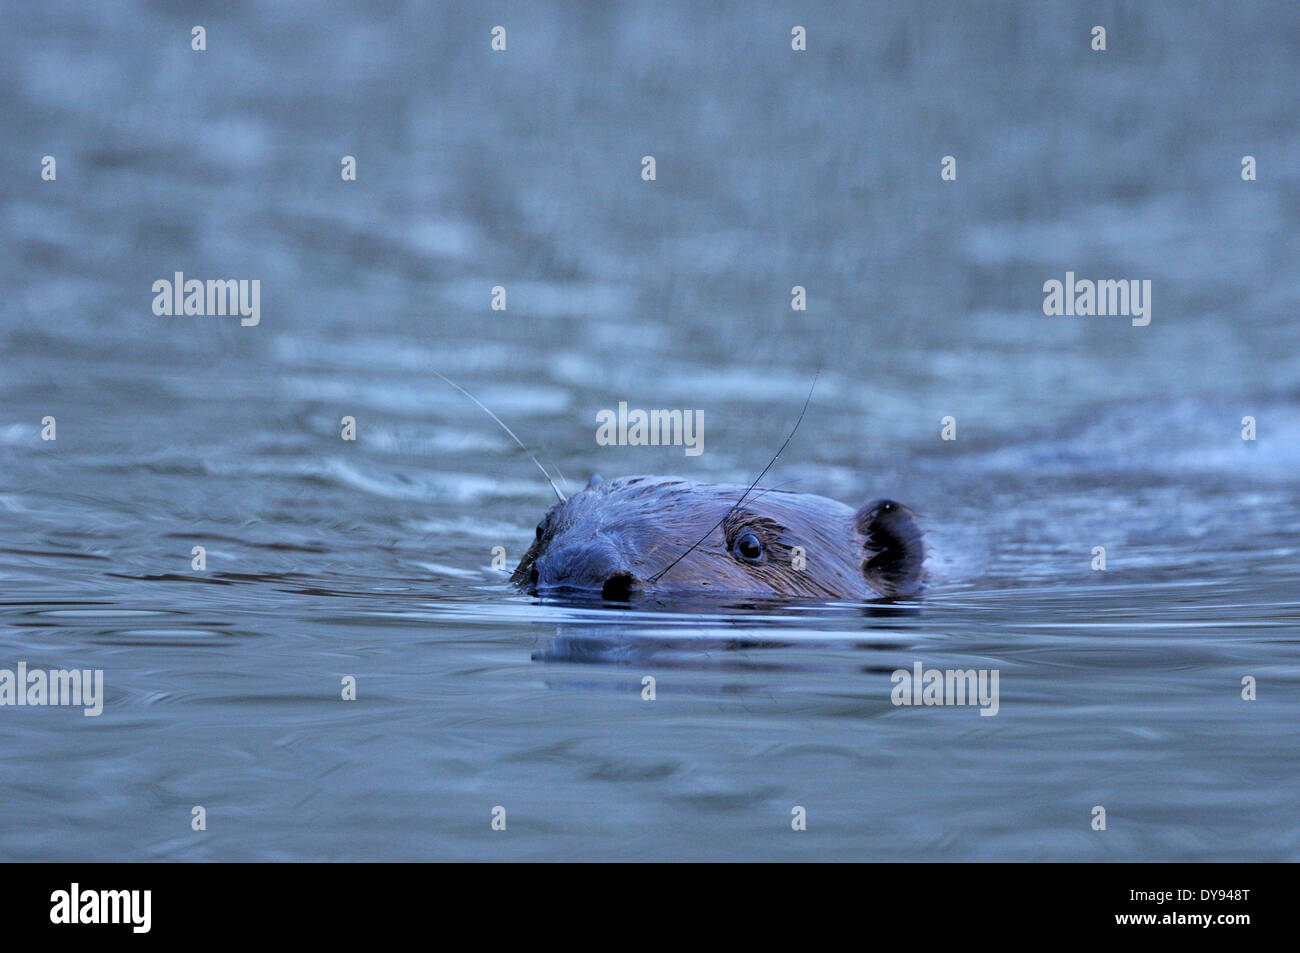 Beavers rodents Castor fiber rodent European beaver mammals rodents beaver damages swimming animal animals Germany - Stock Image